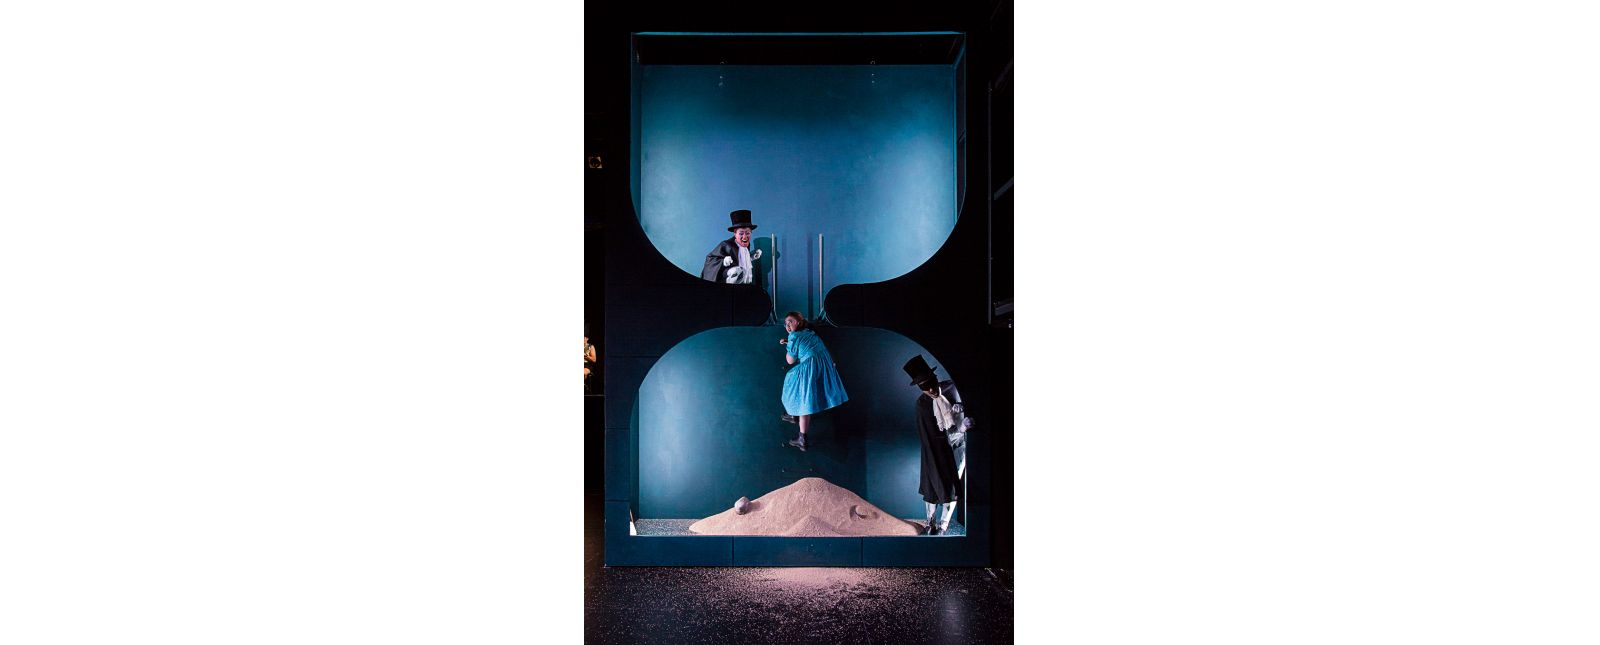 Wunderland // Julienne Mbodjé // Irina Jae Eun Park // John Carpenter // 2018 // Laura Nickel